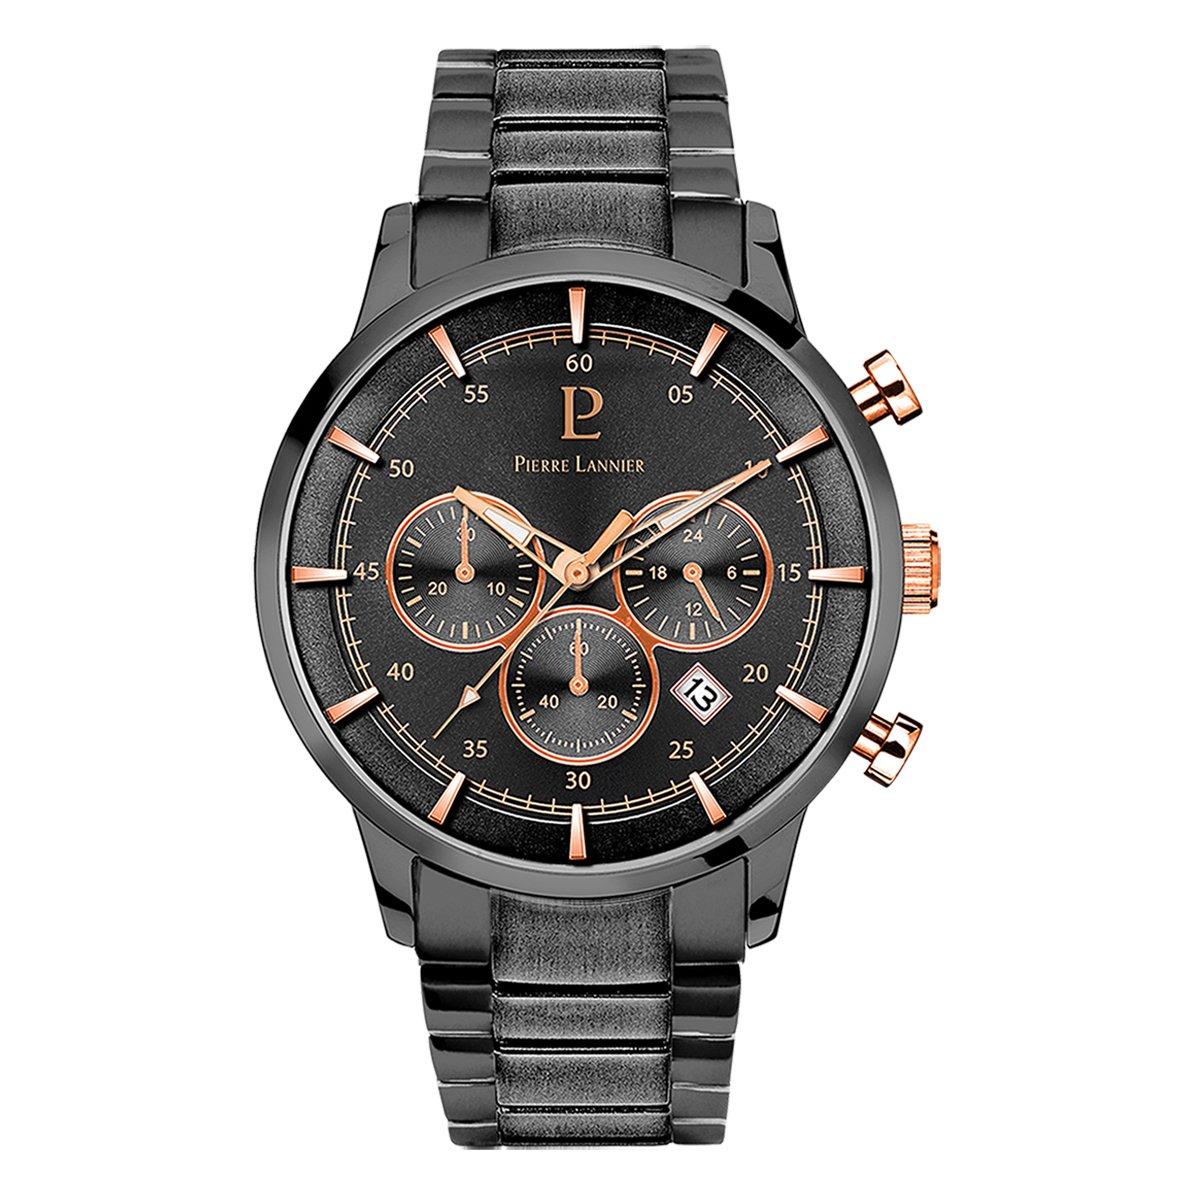 Men's Watch Pierre Lannier - 244F489 - ELEGANCE CHRONO - Chronograph - Date - Deep Grey by Pierre Lannier